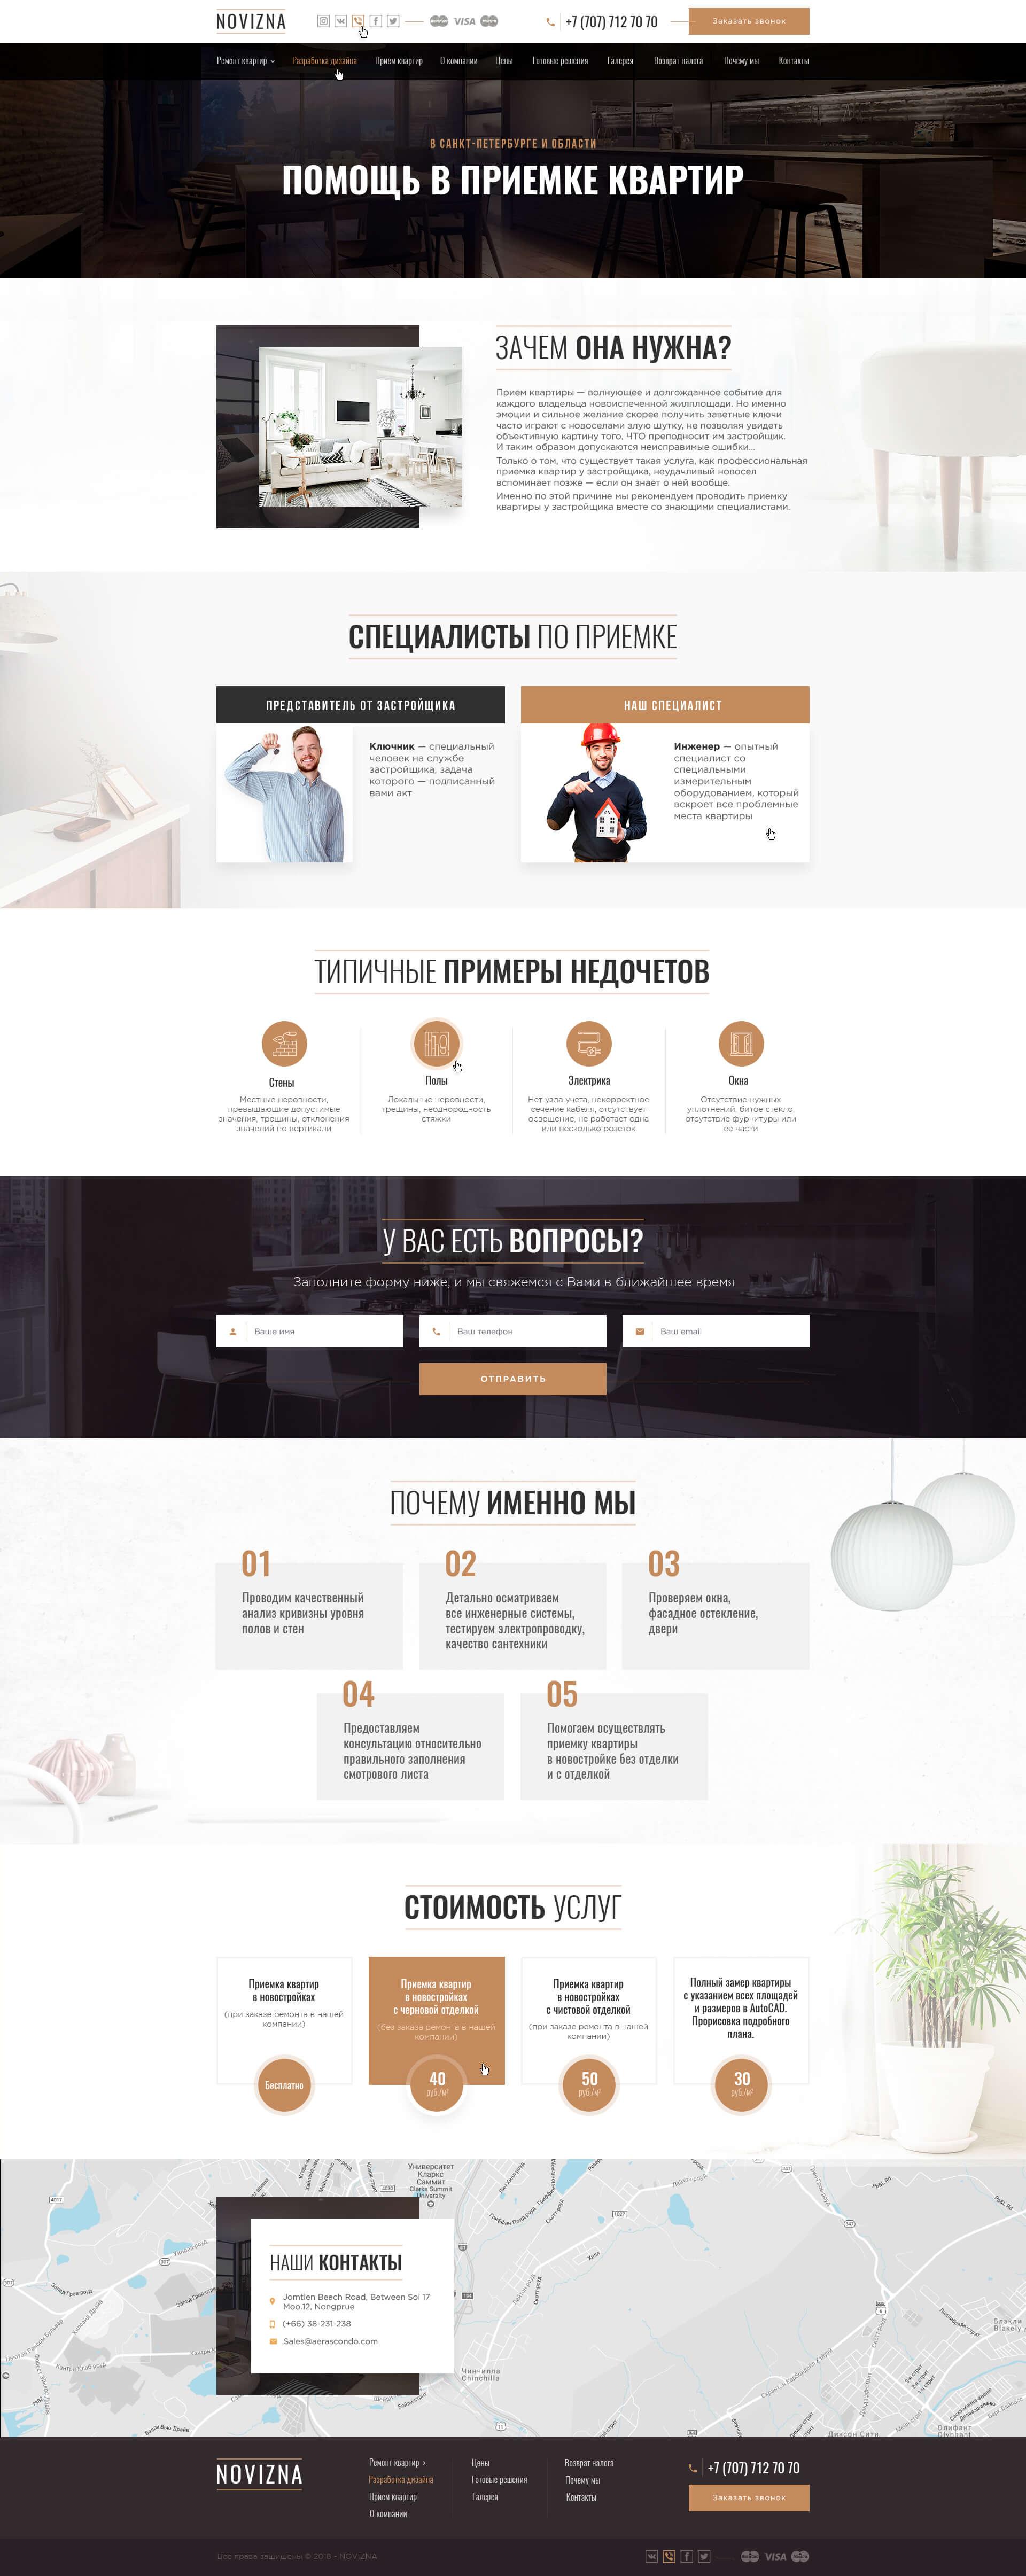 Novizna_priyemka-kvartiry_2